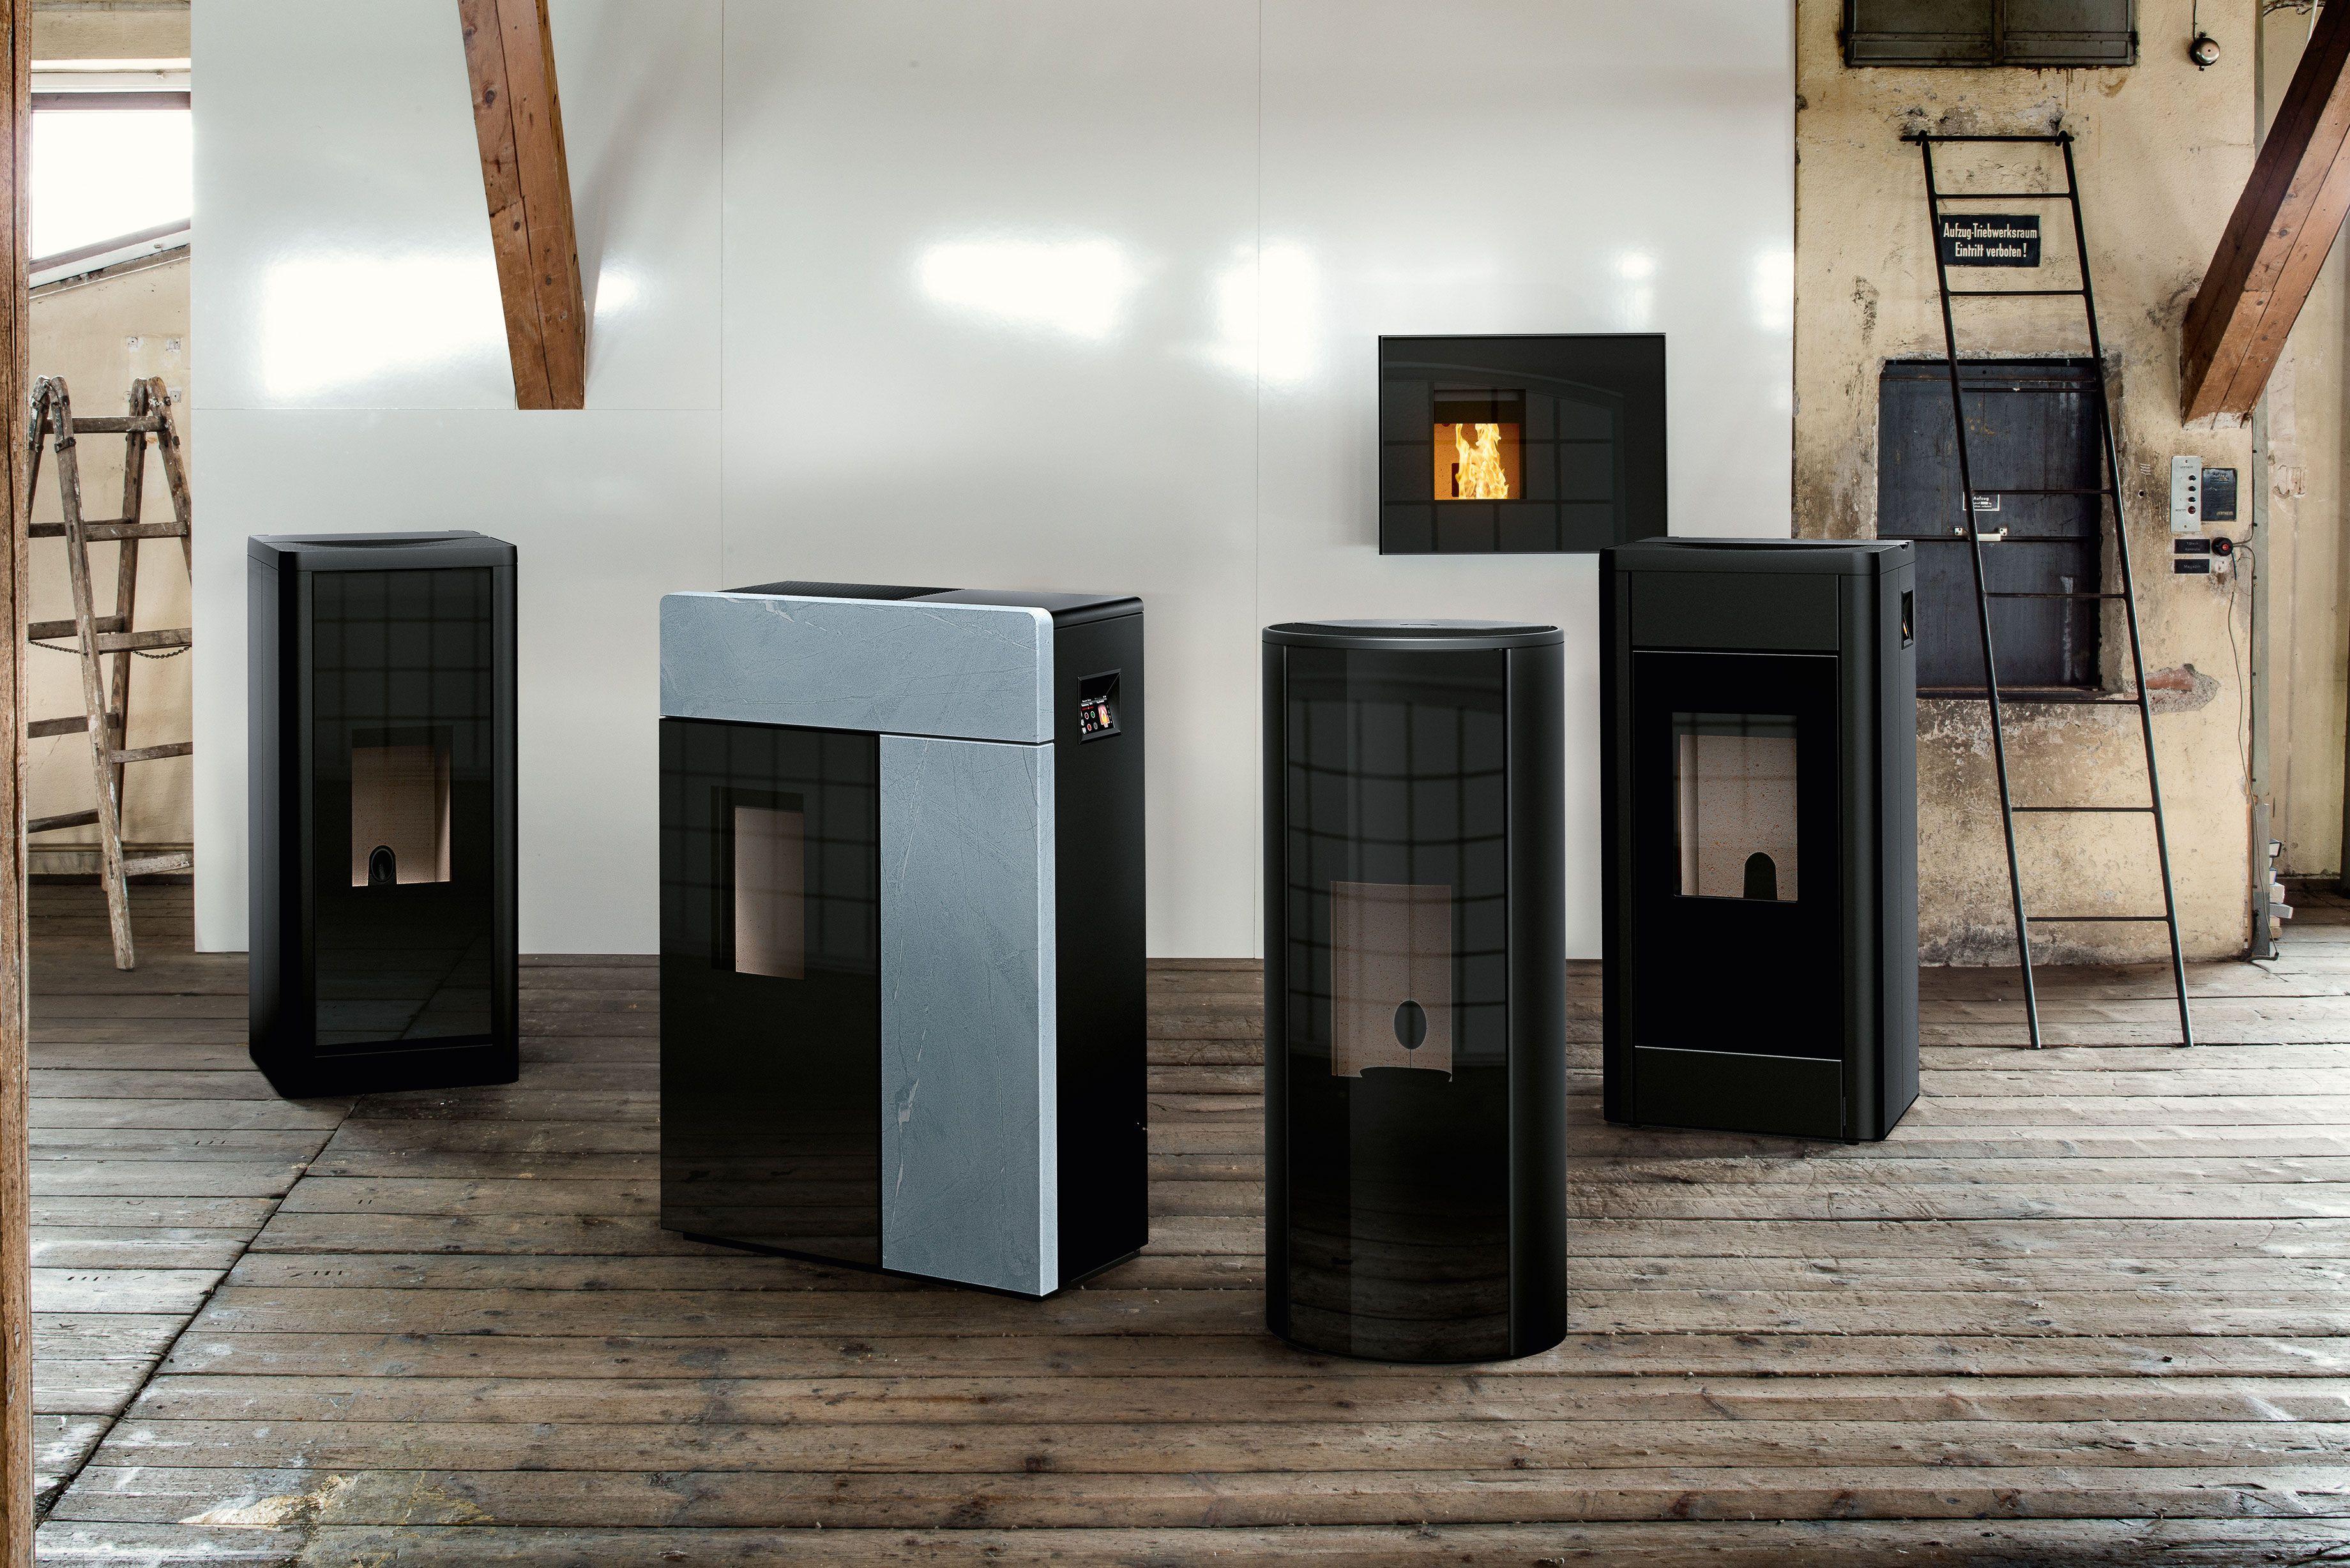 rika fen innovatives heizen mit pellets ofen pelletofen heizen innovation feuer rika. Black Bedroom Furniture Sets. Home Design Ideas